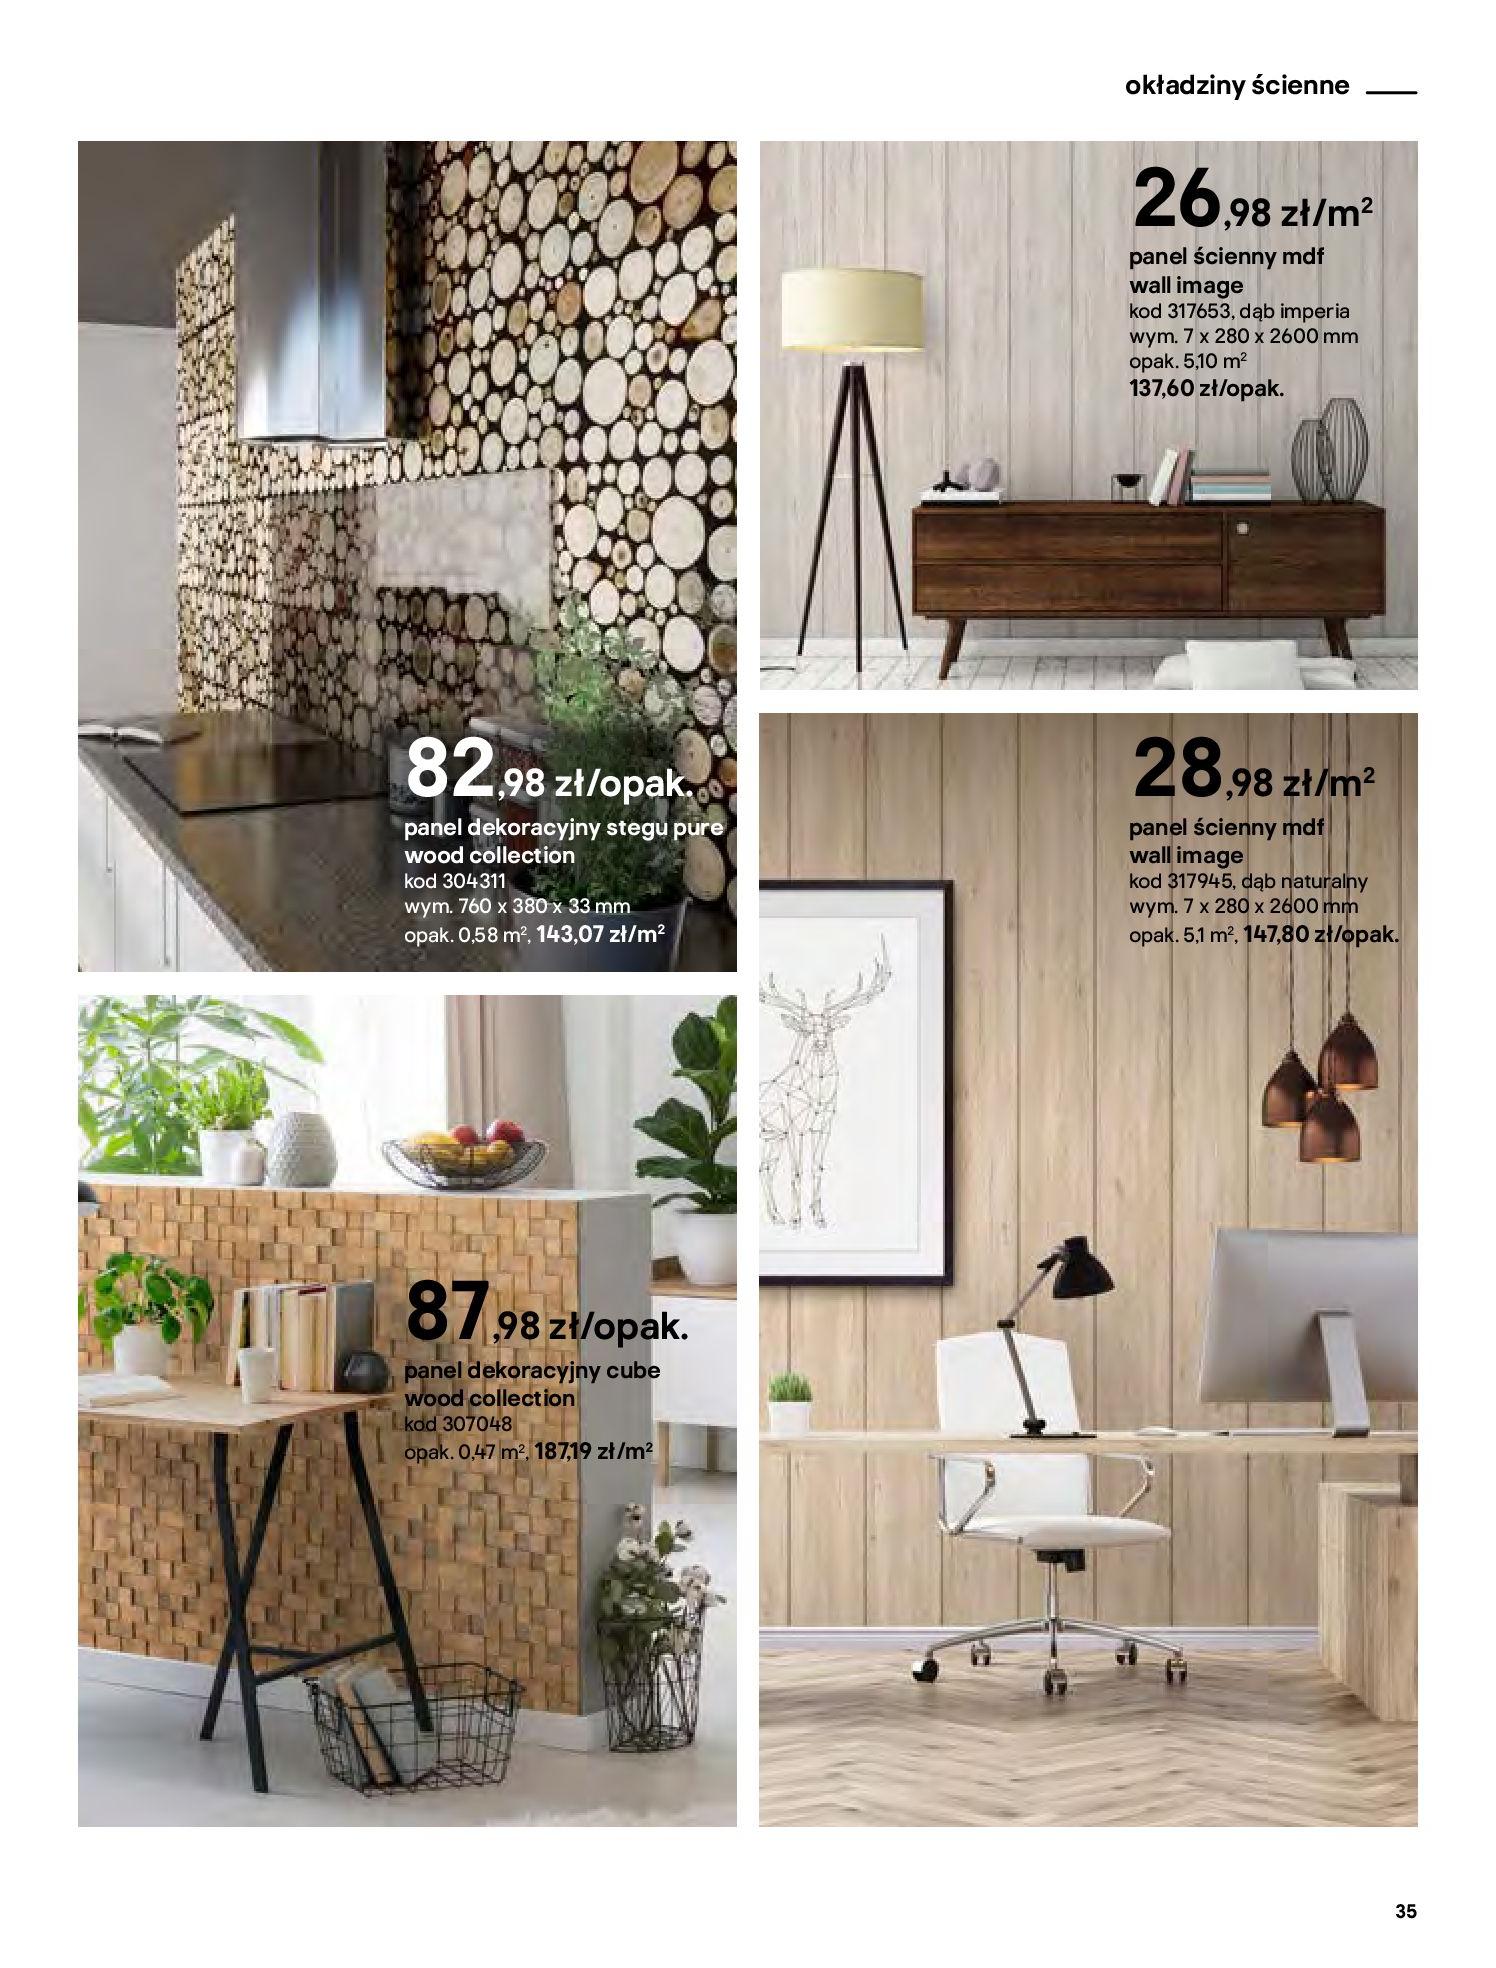 Gazetka Castorama - Katalog Dekoracje-22.10.2020-31.12.2020-page-35